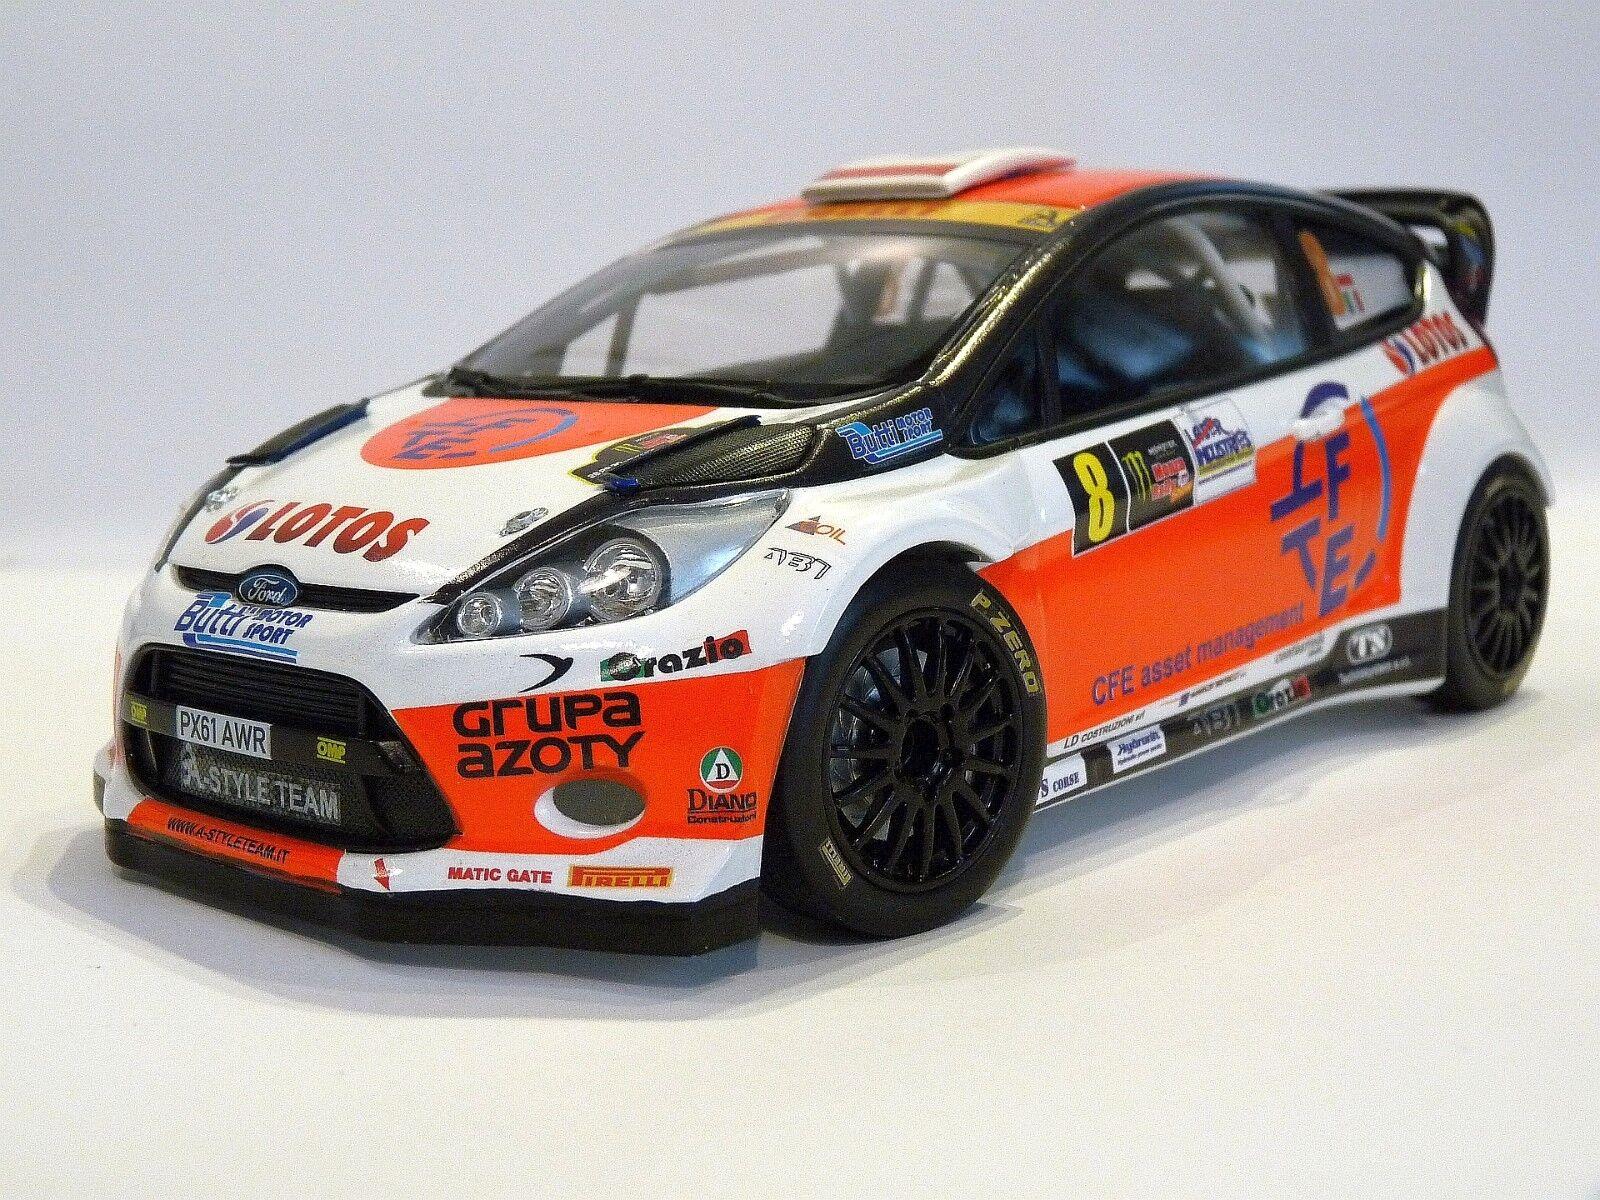 1:18 SCALA ROBERT KUBICA MONZA RALLY SHOW 2014 CODICE 3 modello FORD FIESTA WRC